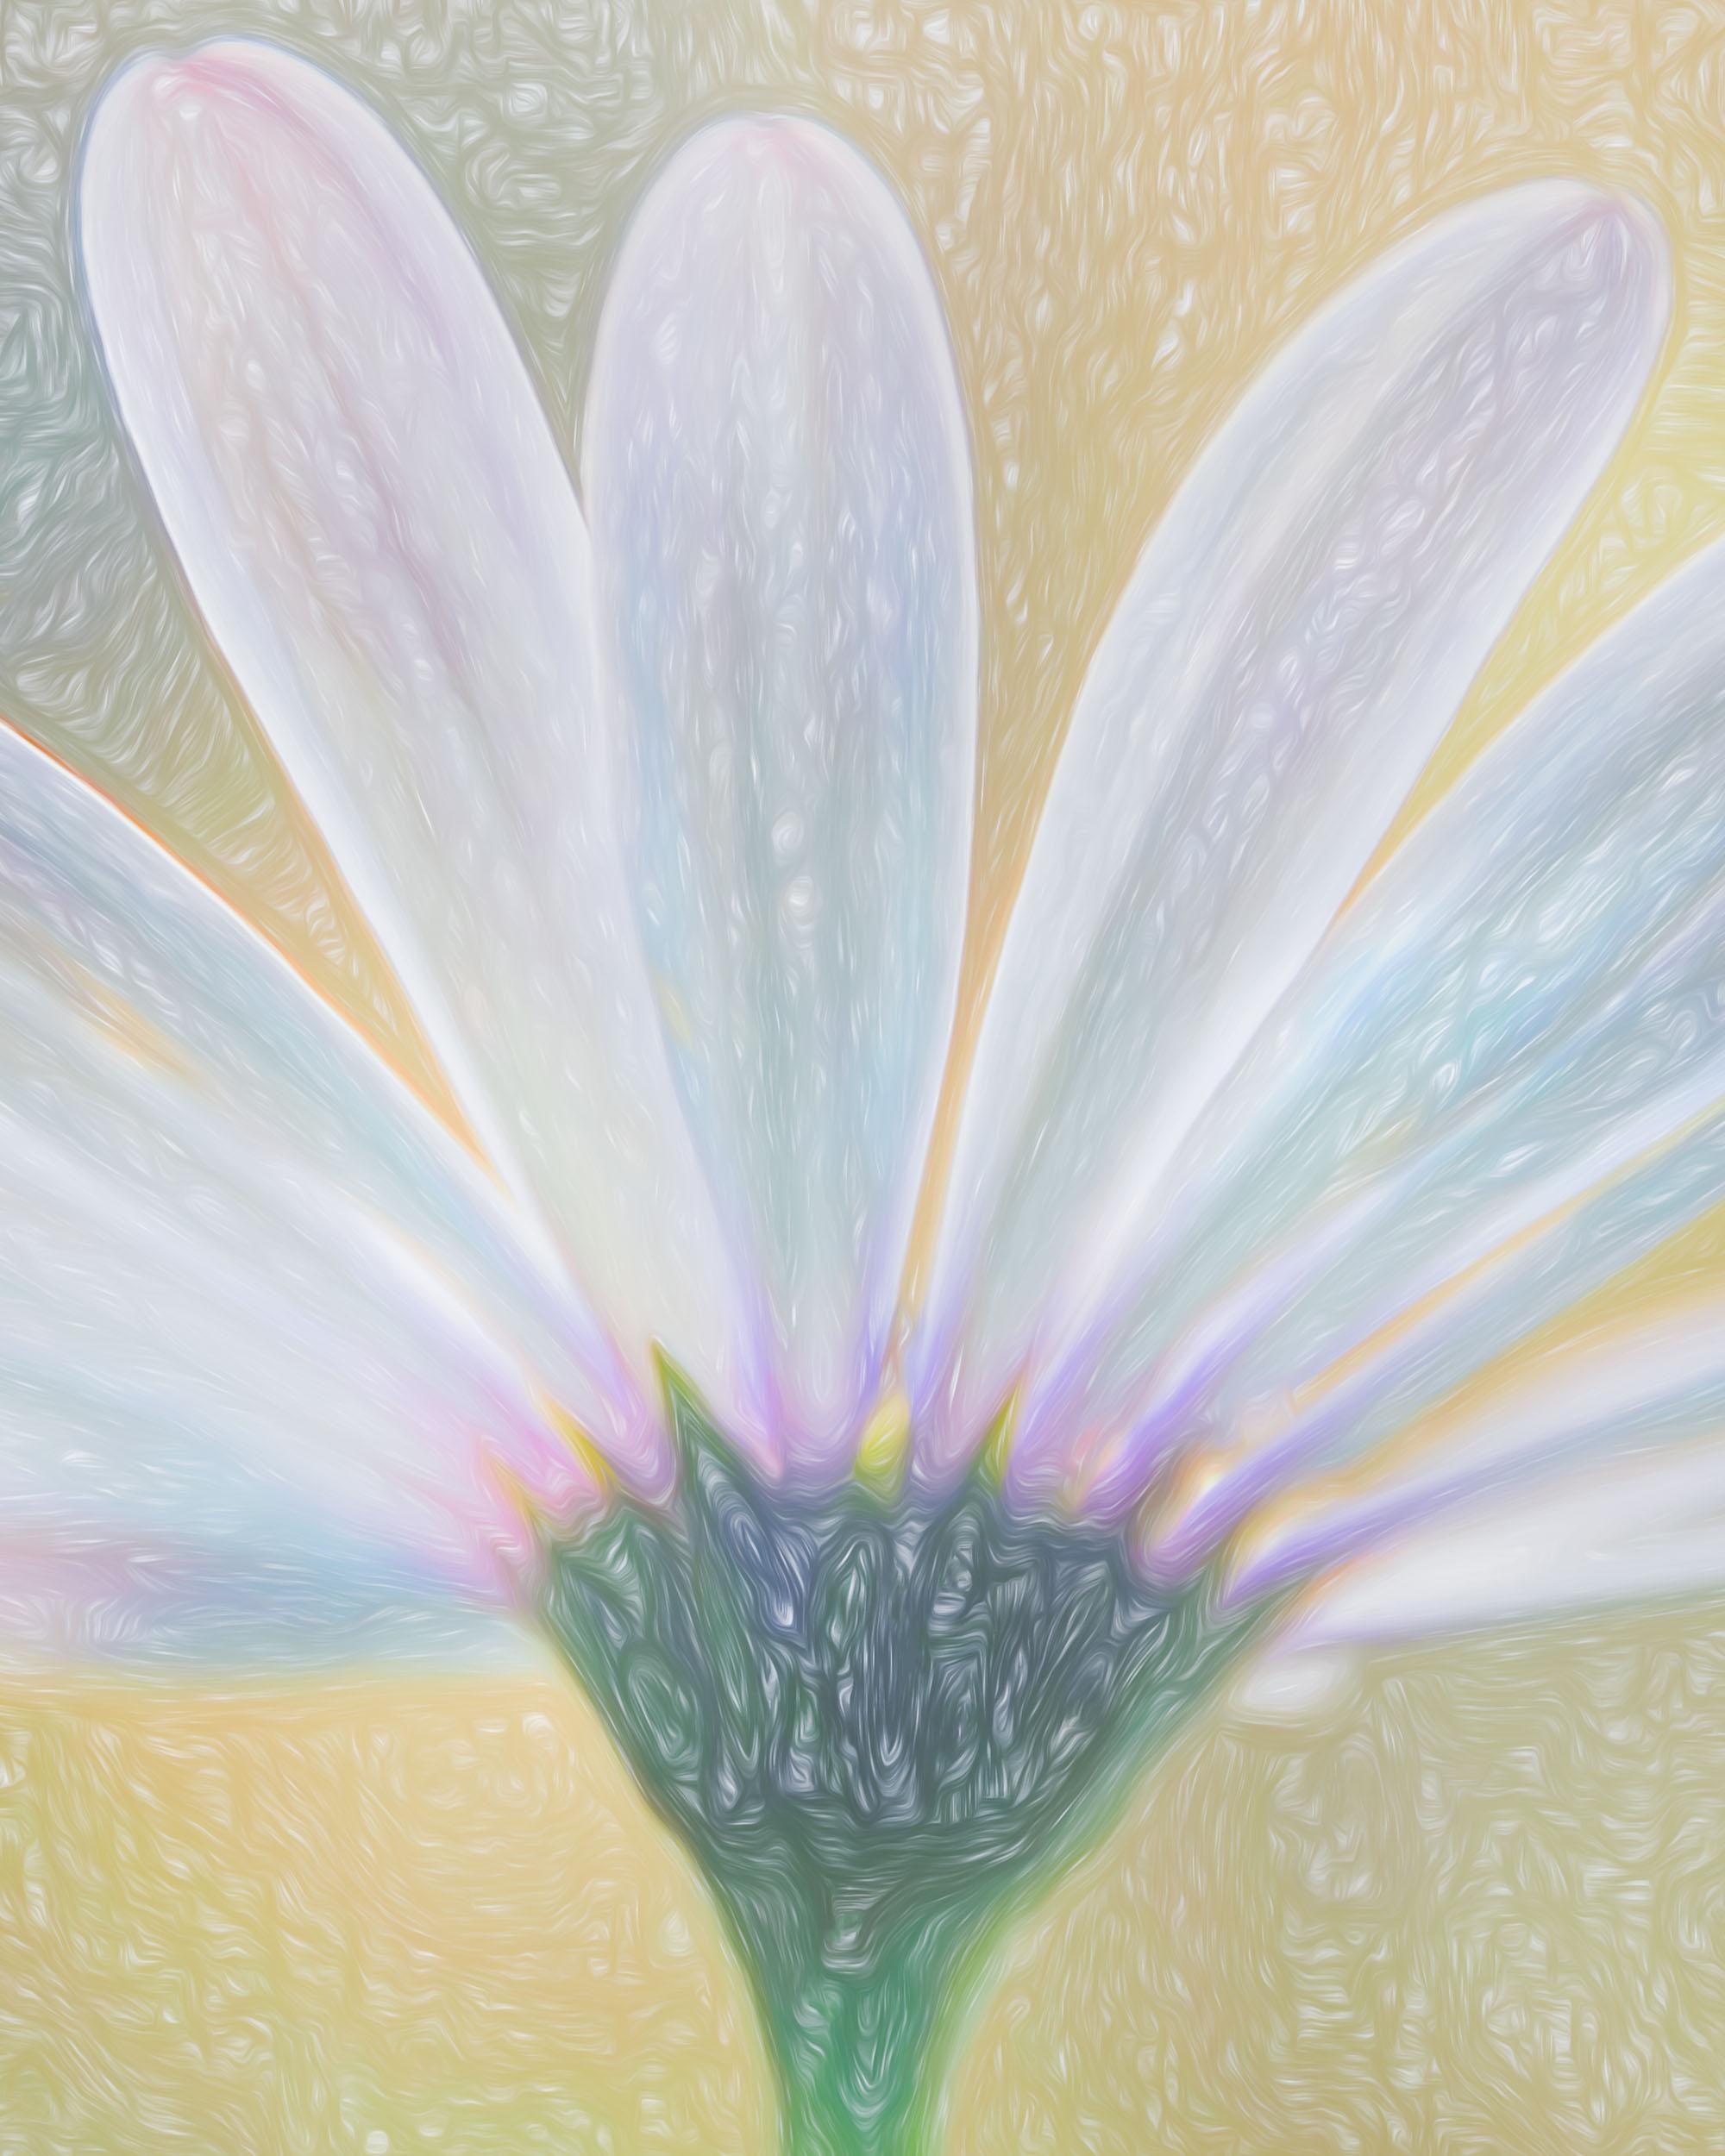 """Light Energy Portrait"" - Photography Artist Kevin Sibbitt"